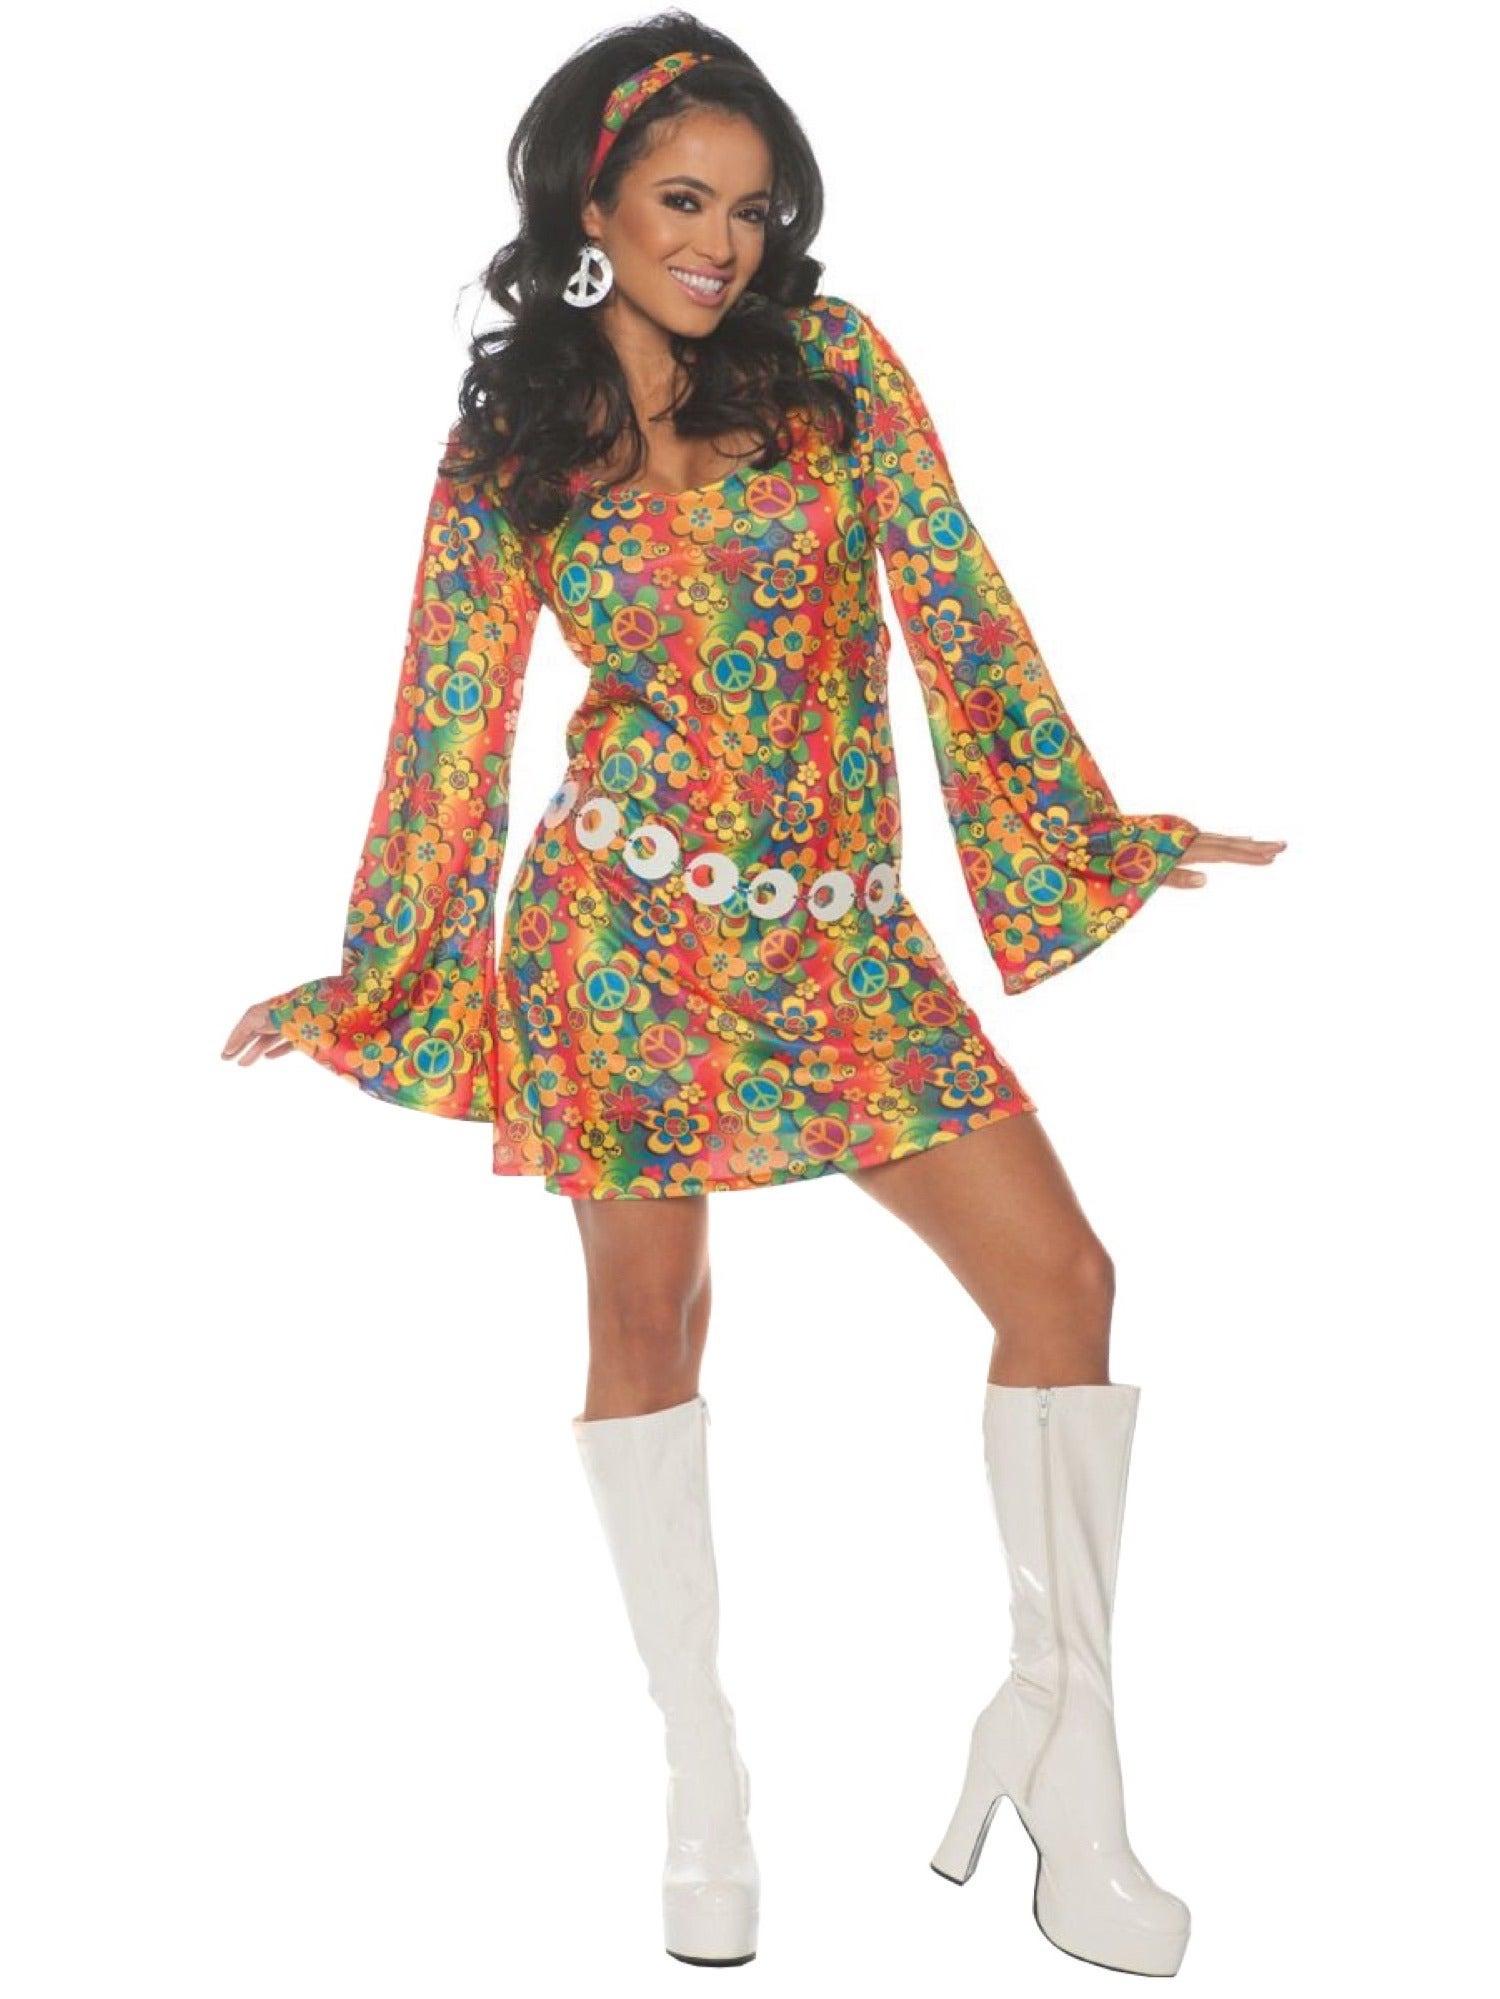 Hobbypos Summer Boogie 1960s Disco Retro Groovy Hippie Hippy Adult Womens Costume